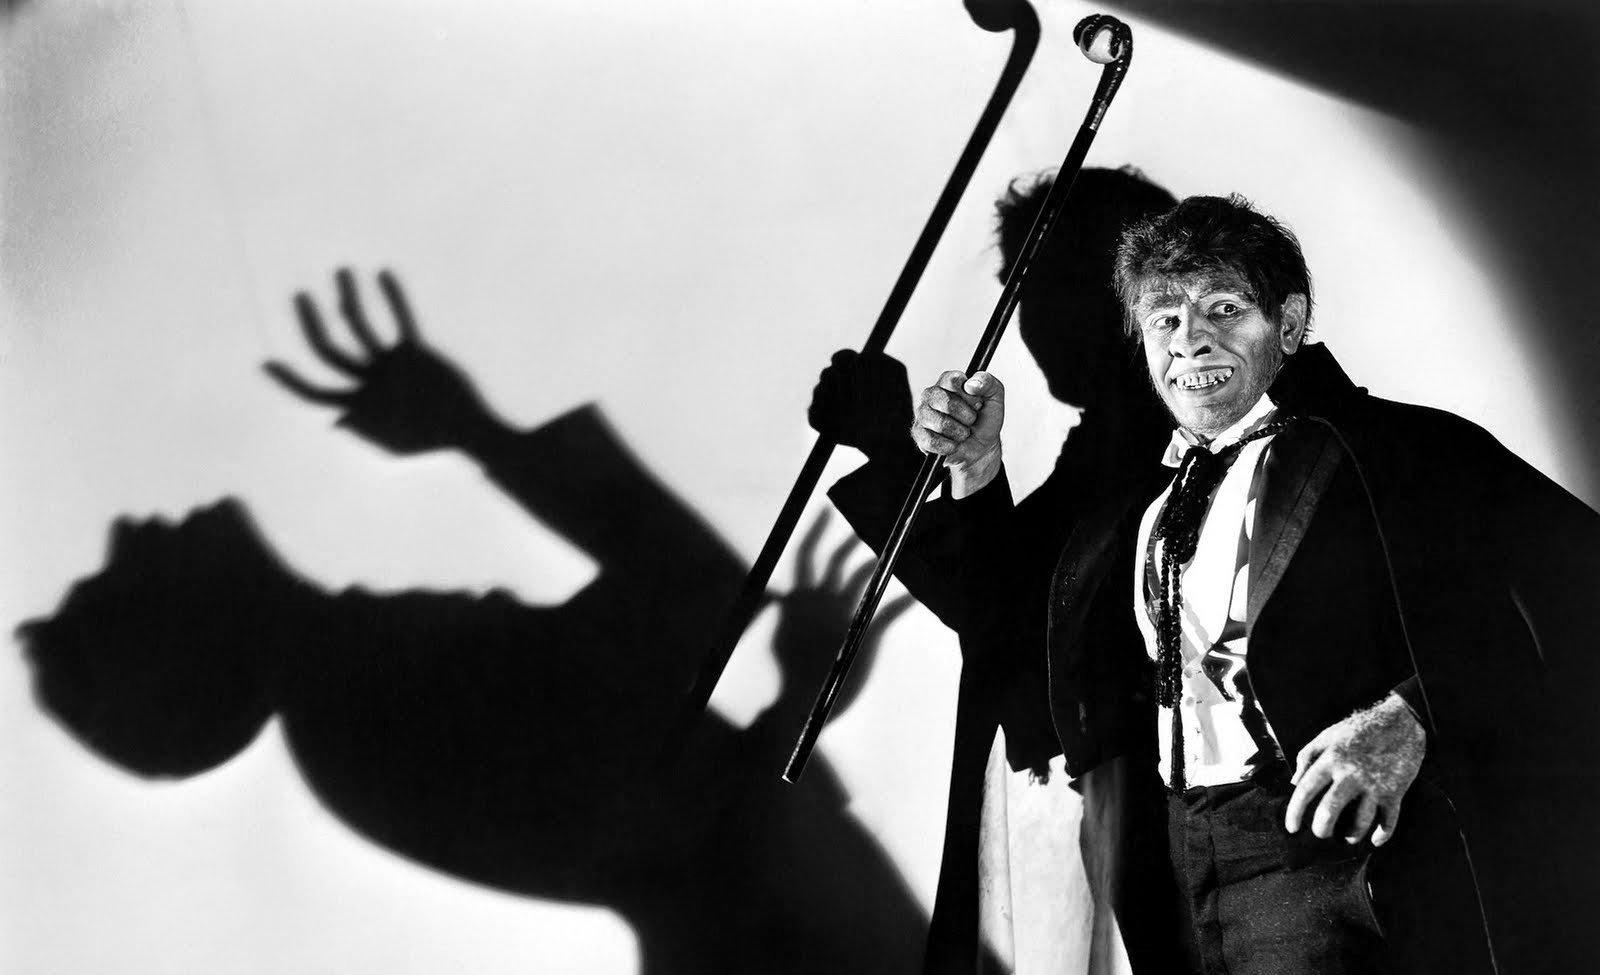 Dr. Jekyll and Mr. Hyde (filme de 1931)